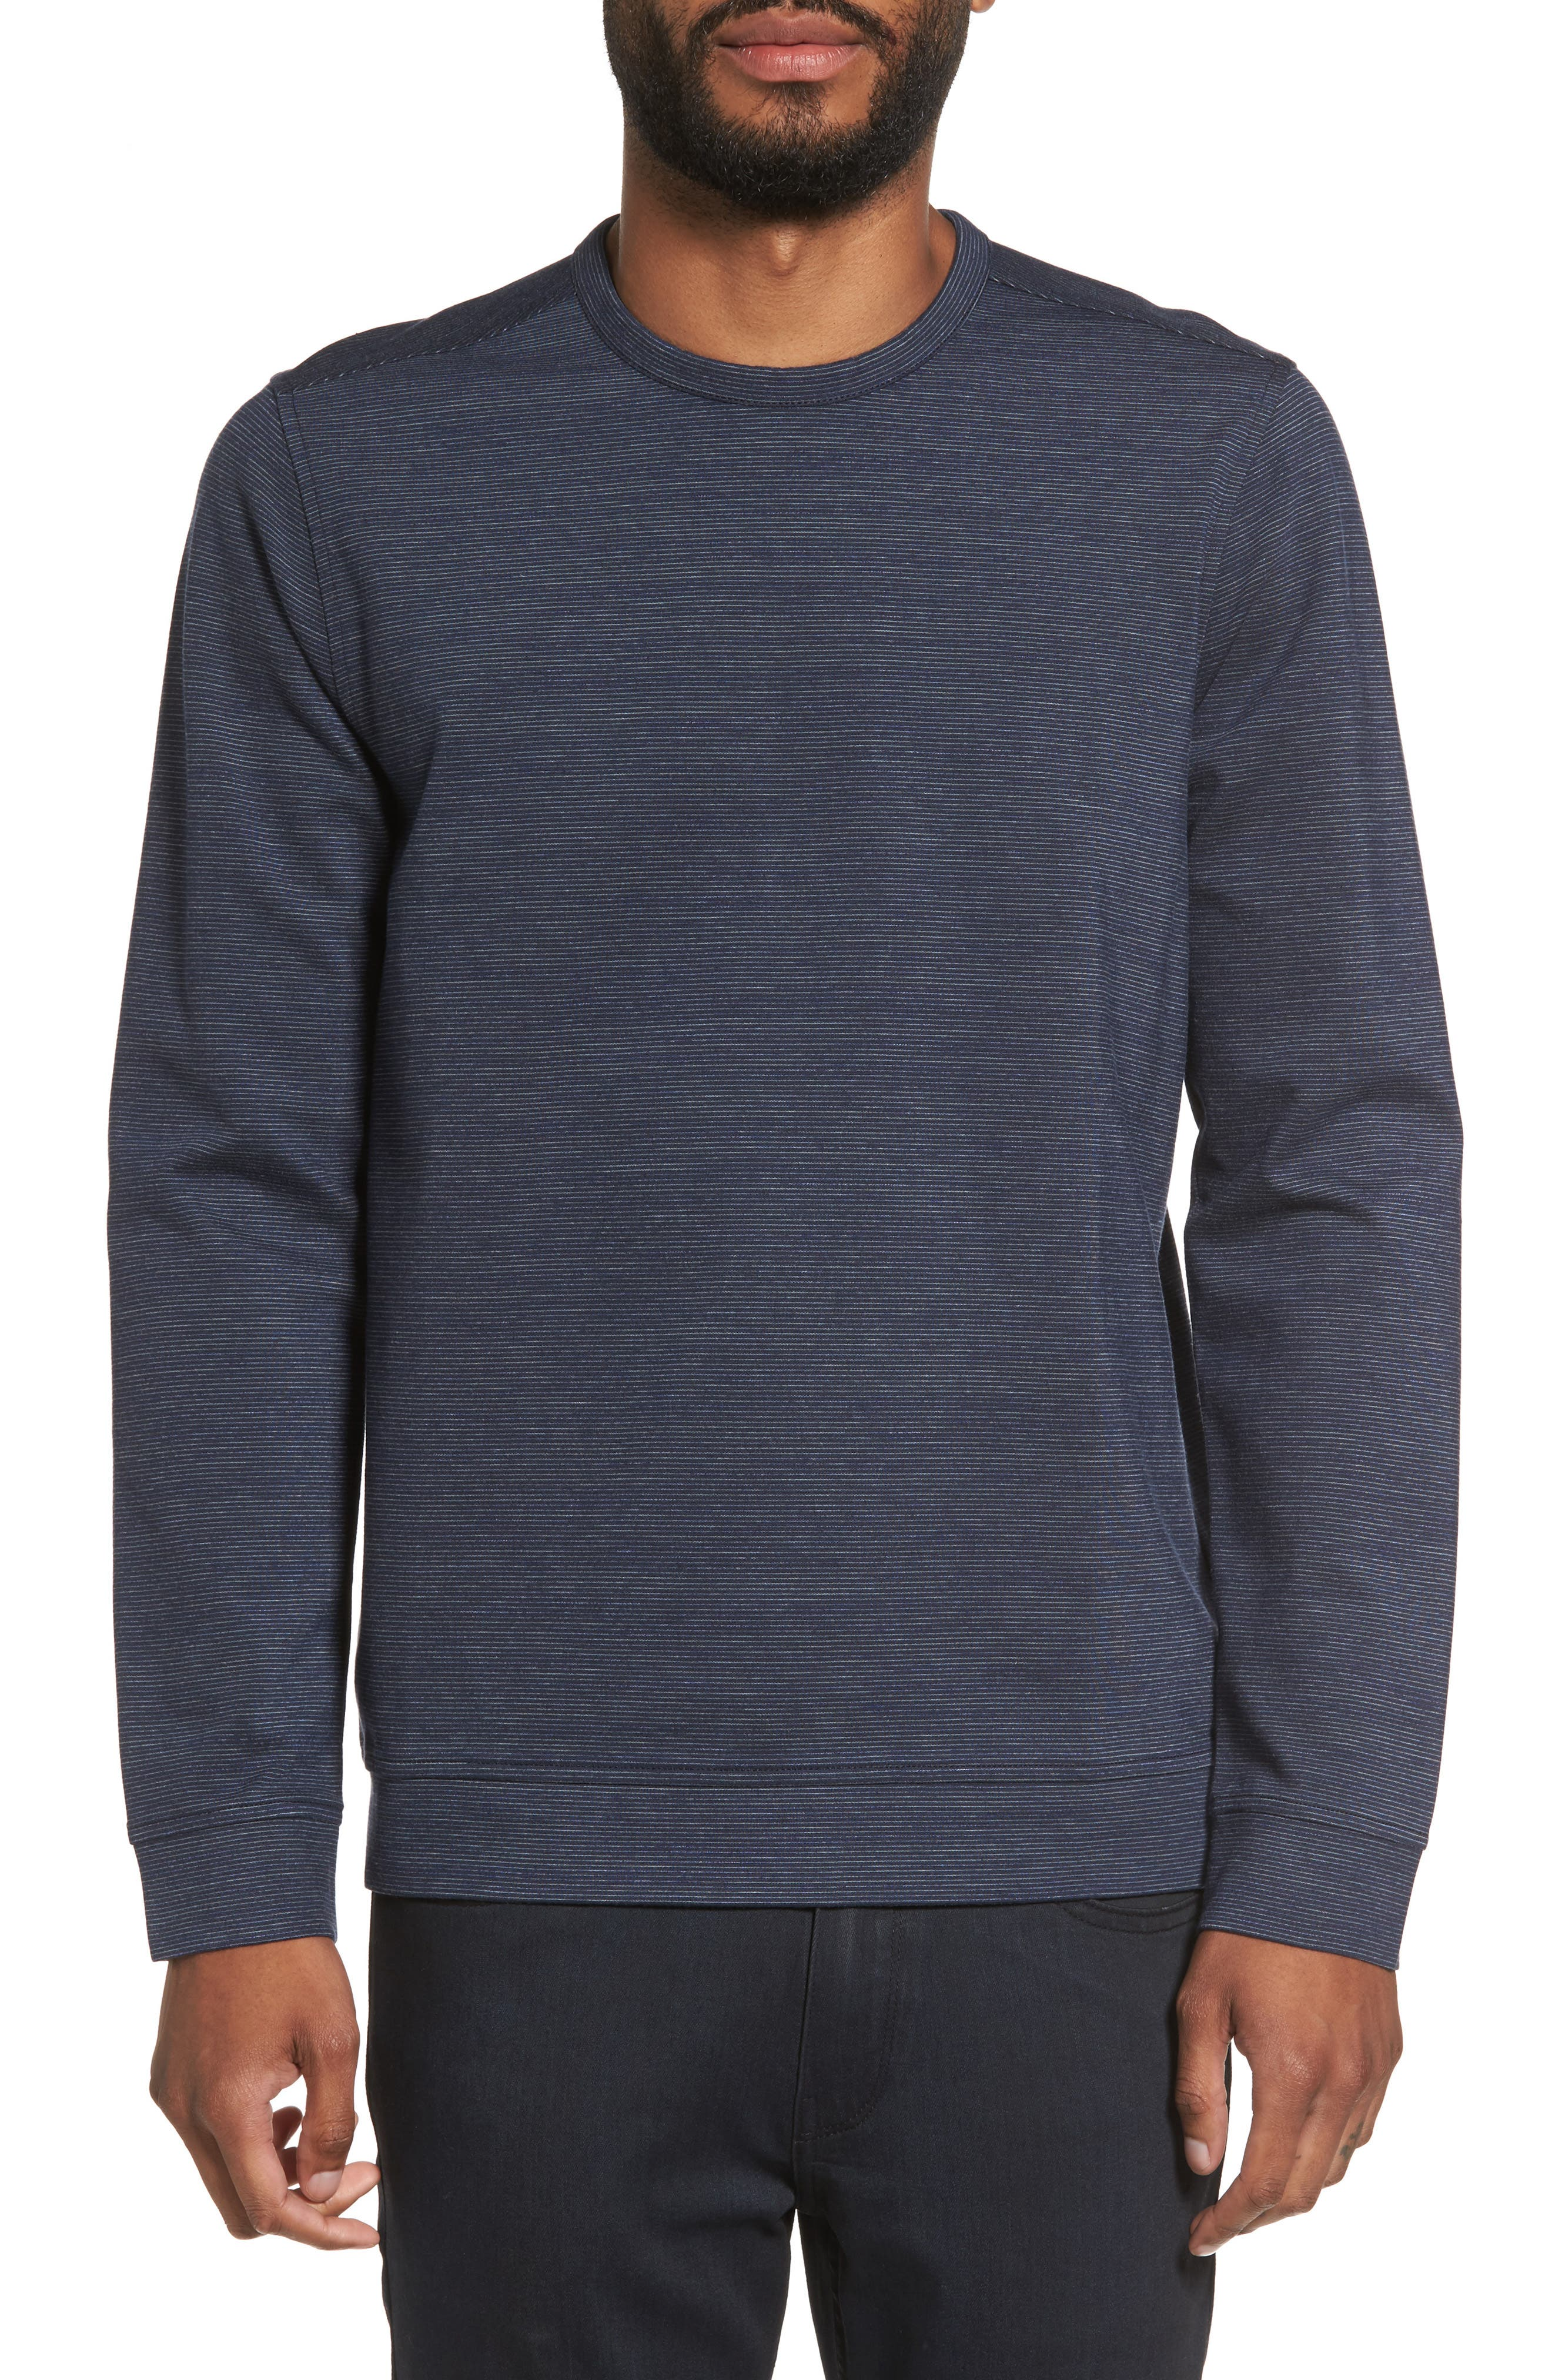 Main Image - Calibrate Space Dye Stripe Sweatshirt